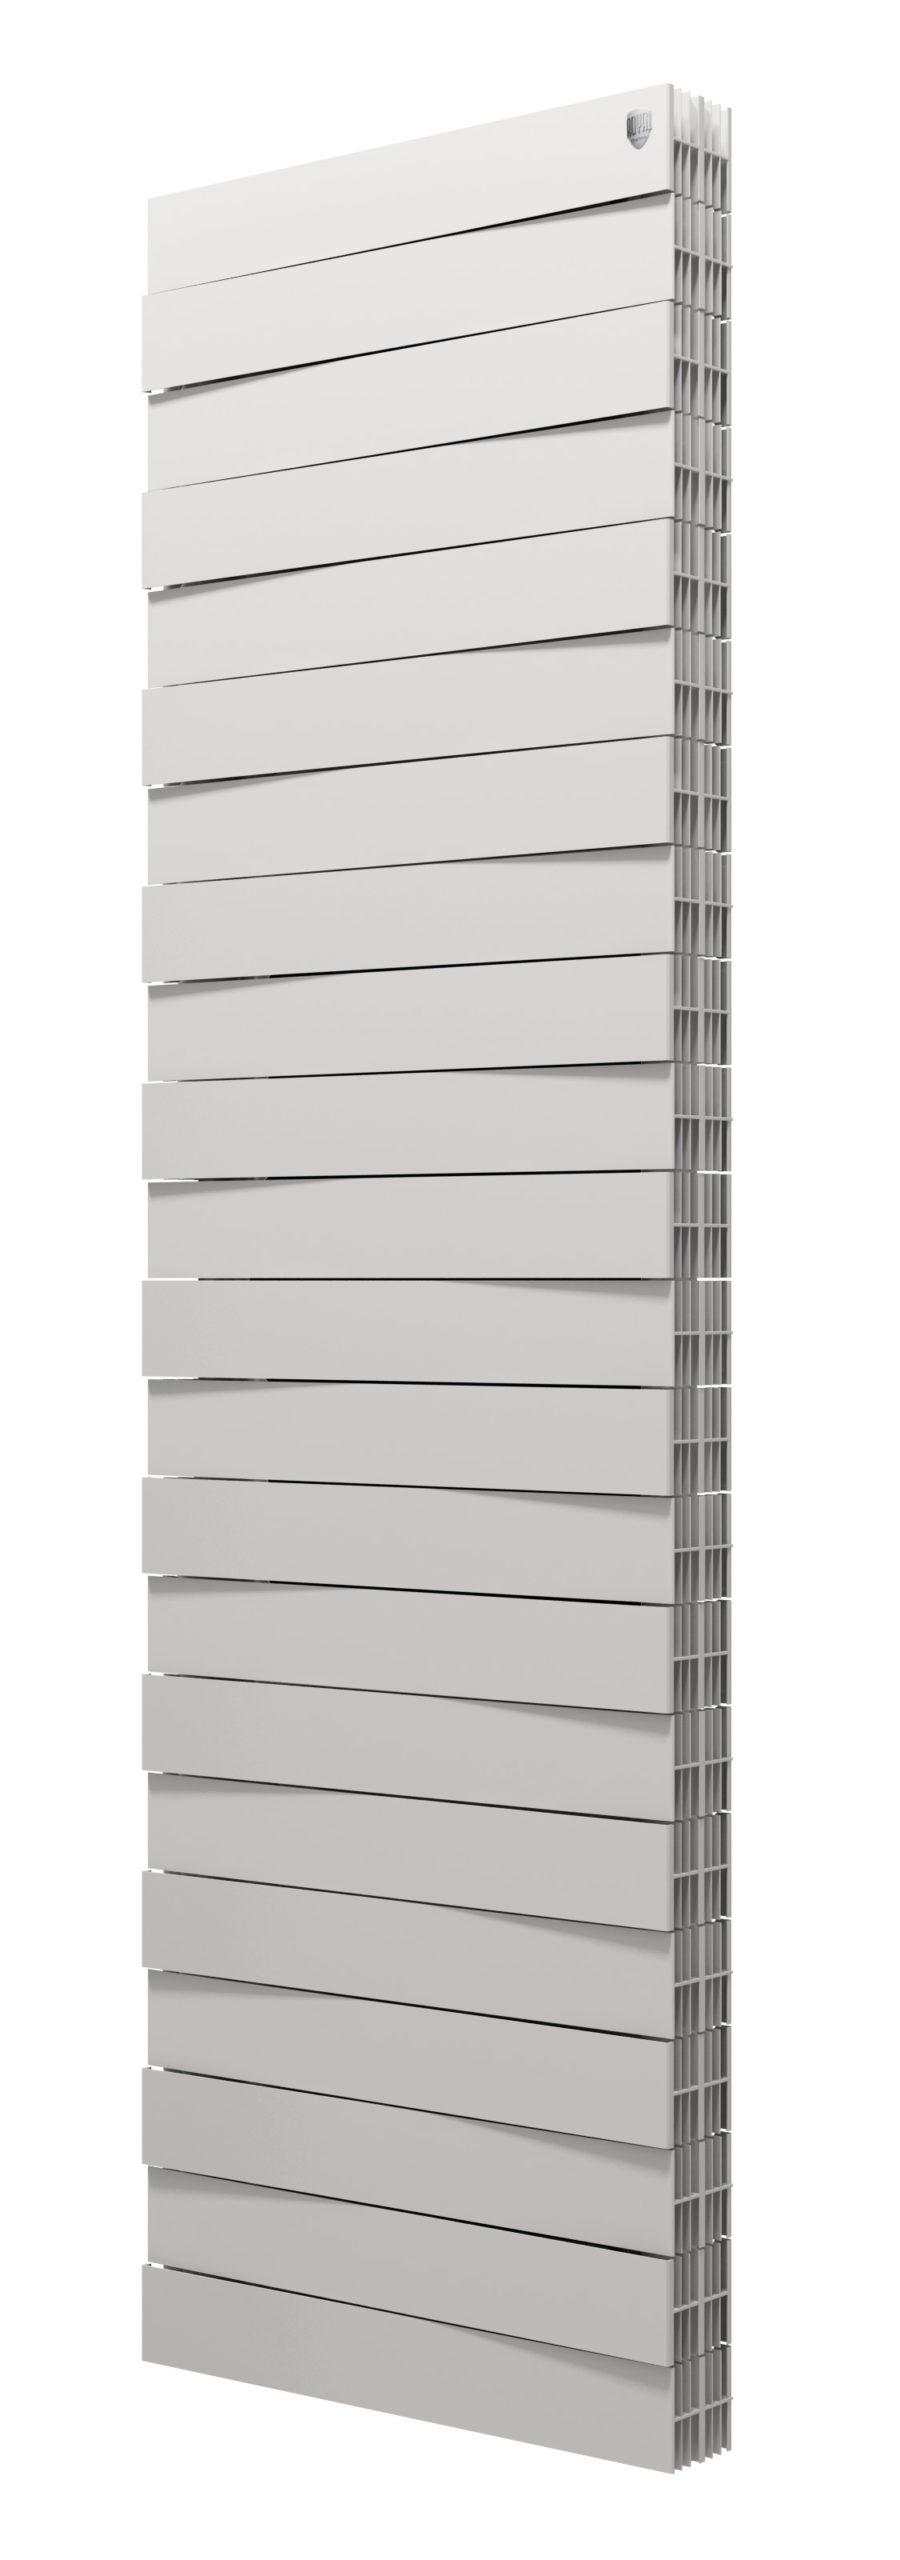 Биметаллические радиаторы Piano Forte Tower фото